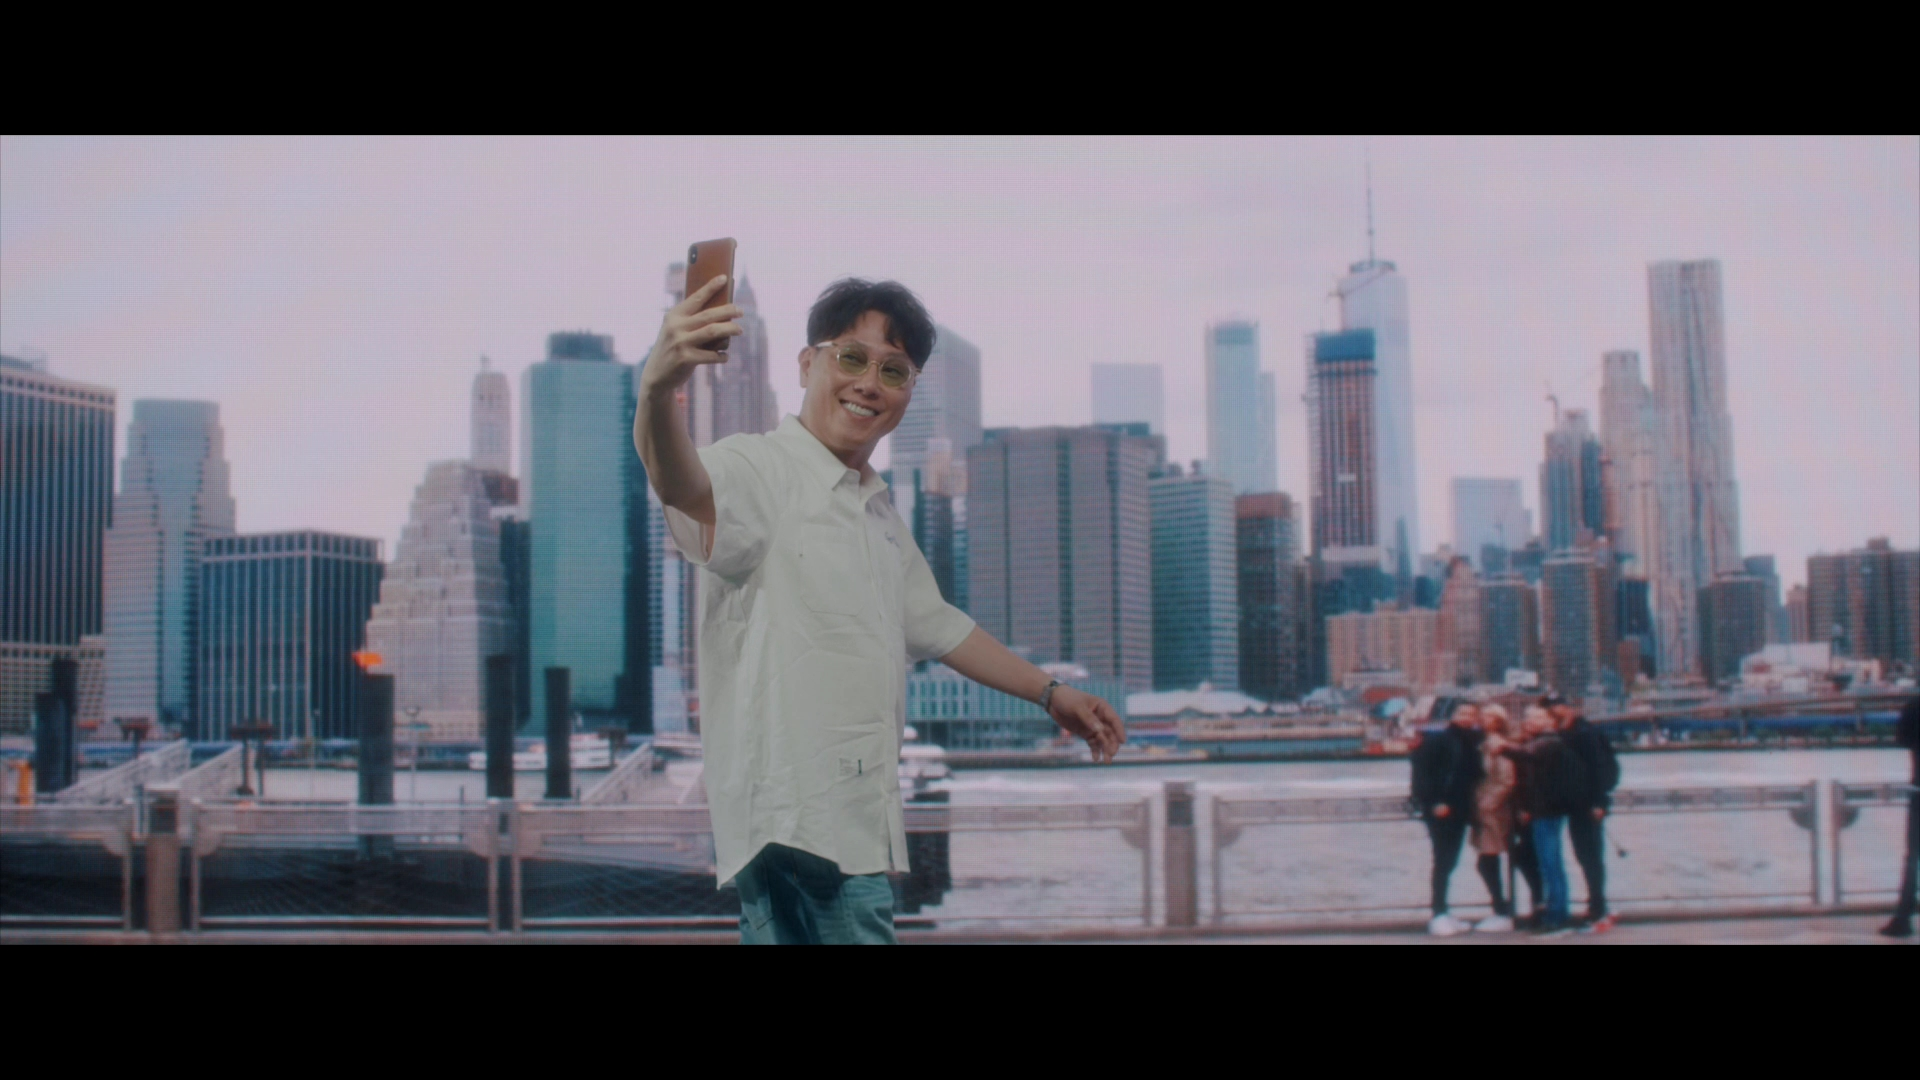 [MV] 2019 월간 윤종신 5월호 - New York